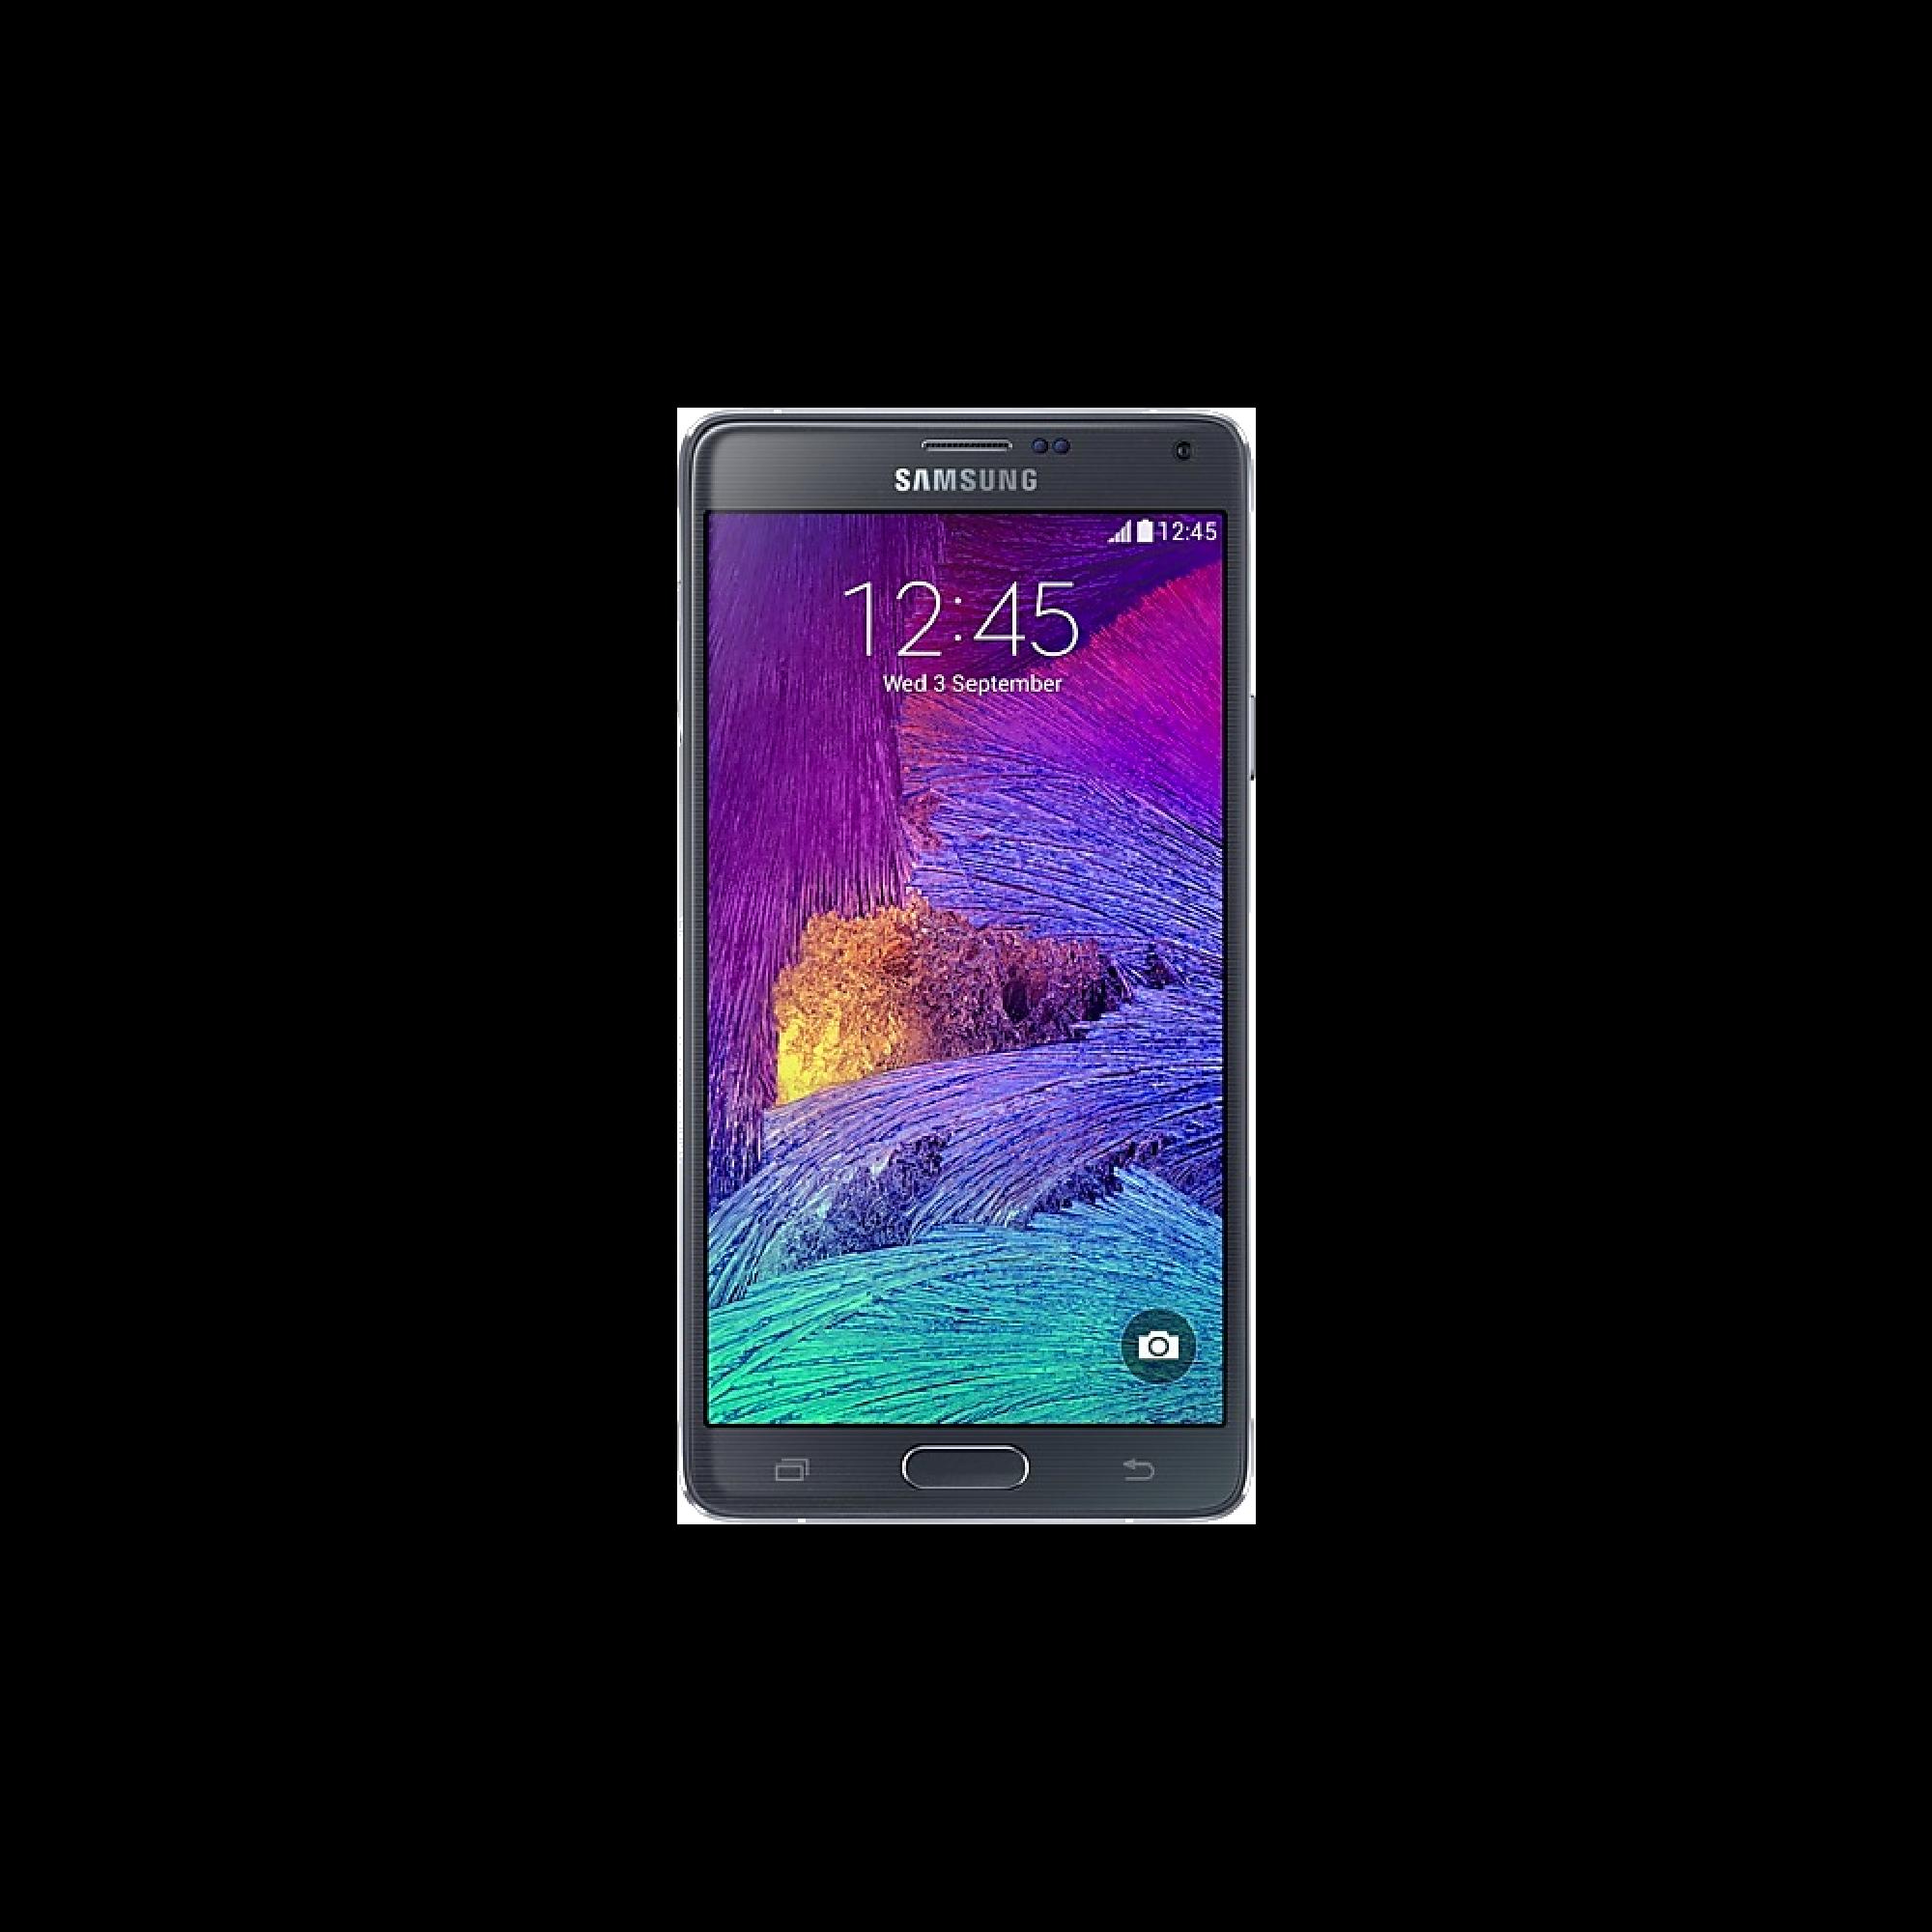 Samsung Note 4 | $150 + tax